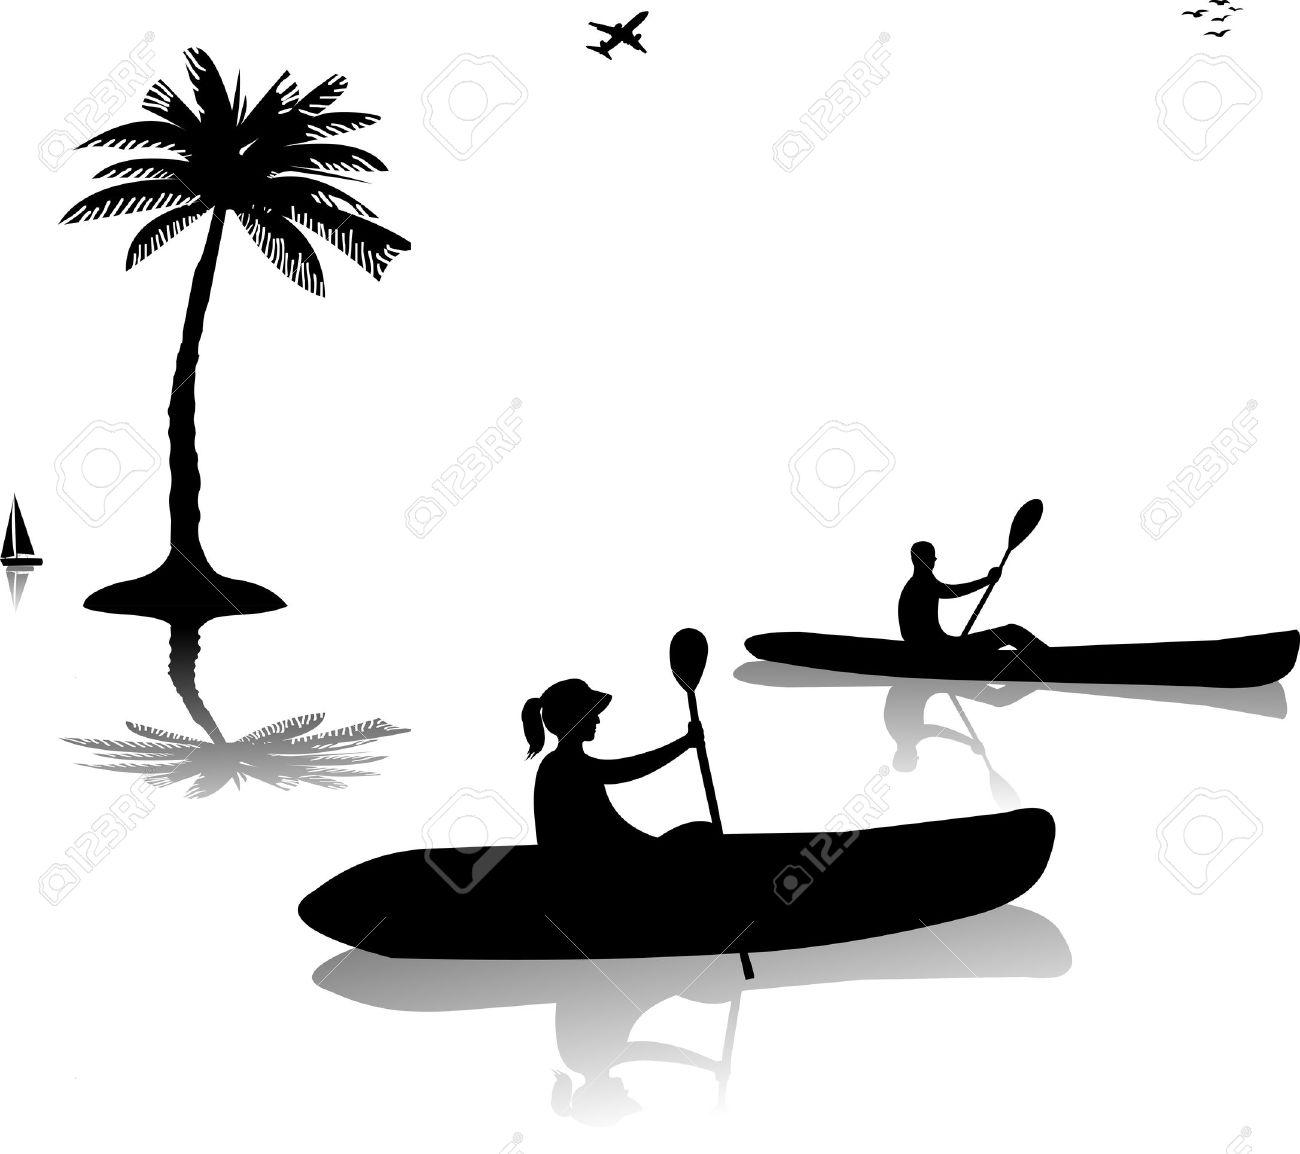 Free kayak clipart images.